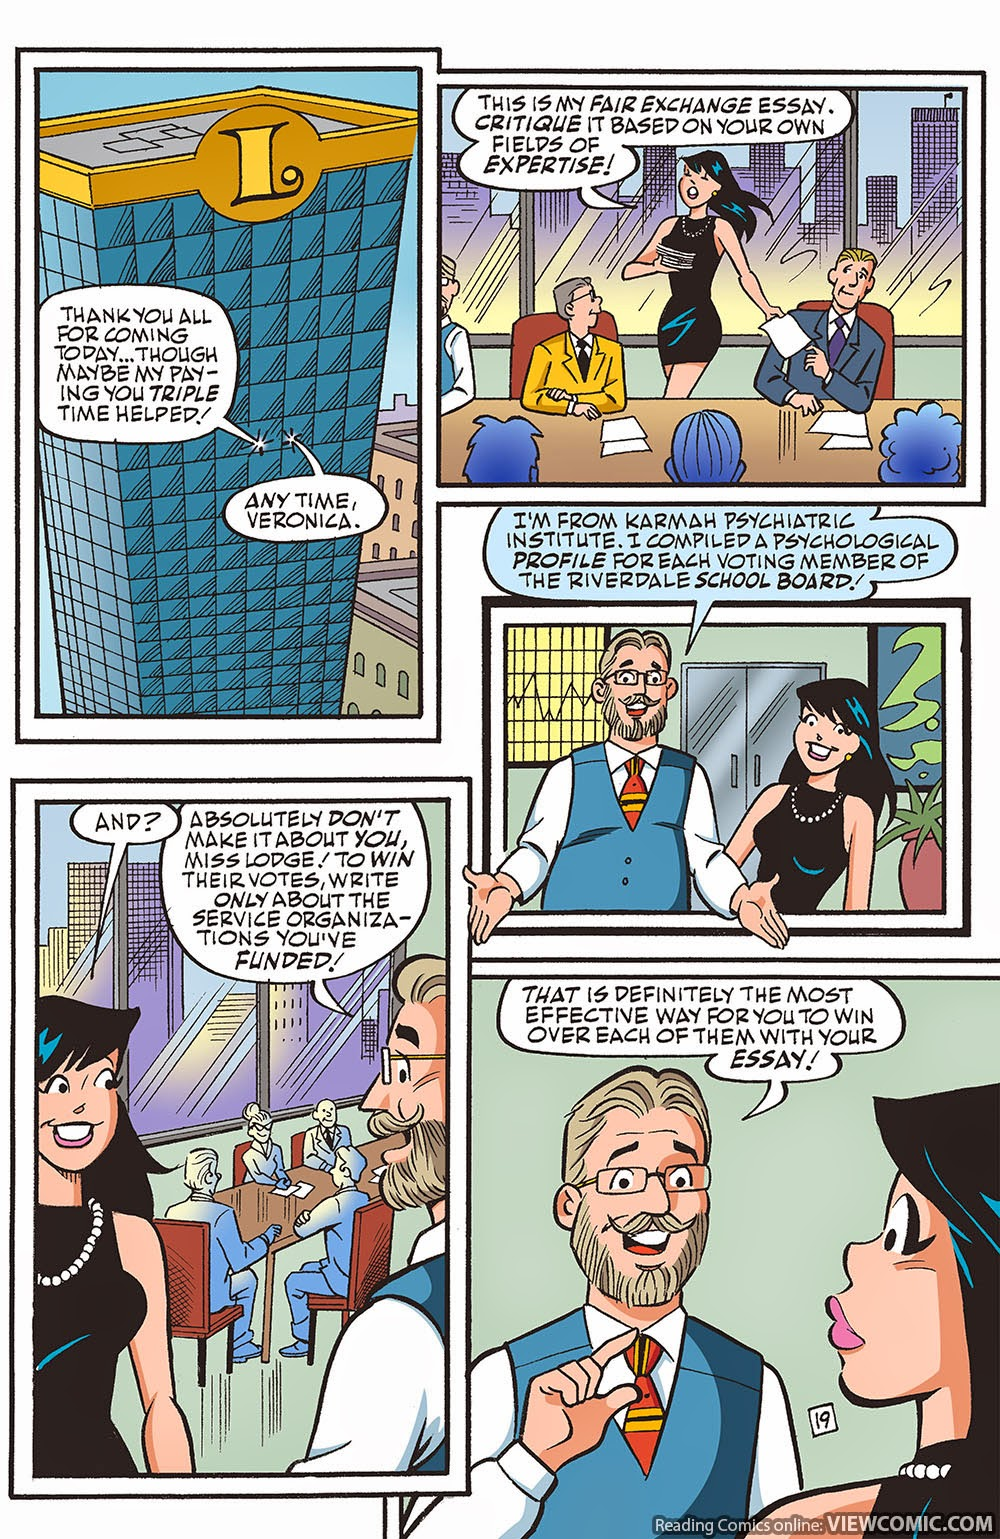 comics essay 首页 论坛 时尚 alan moore occupy comics essay writing – 805377 该话题包含 0 回复,有 1 参与者,并且由 obobperneri 于 2 月, 2 周 前 最后一次更新.